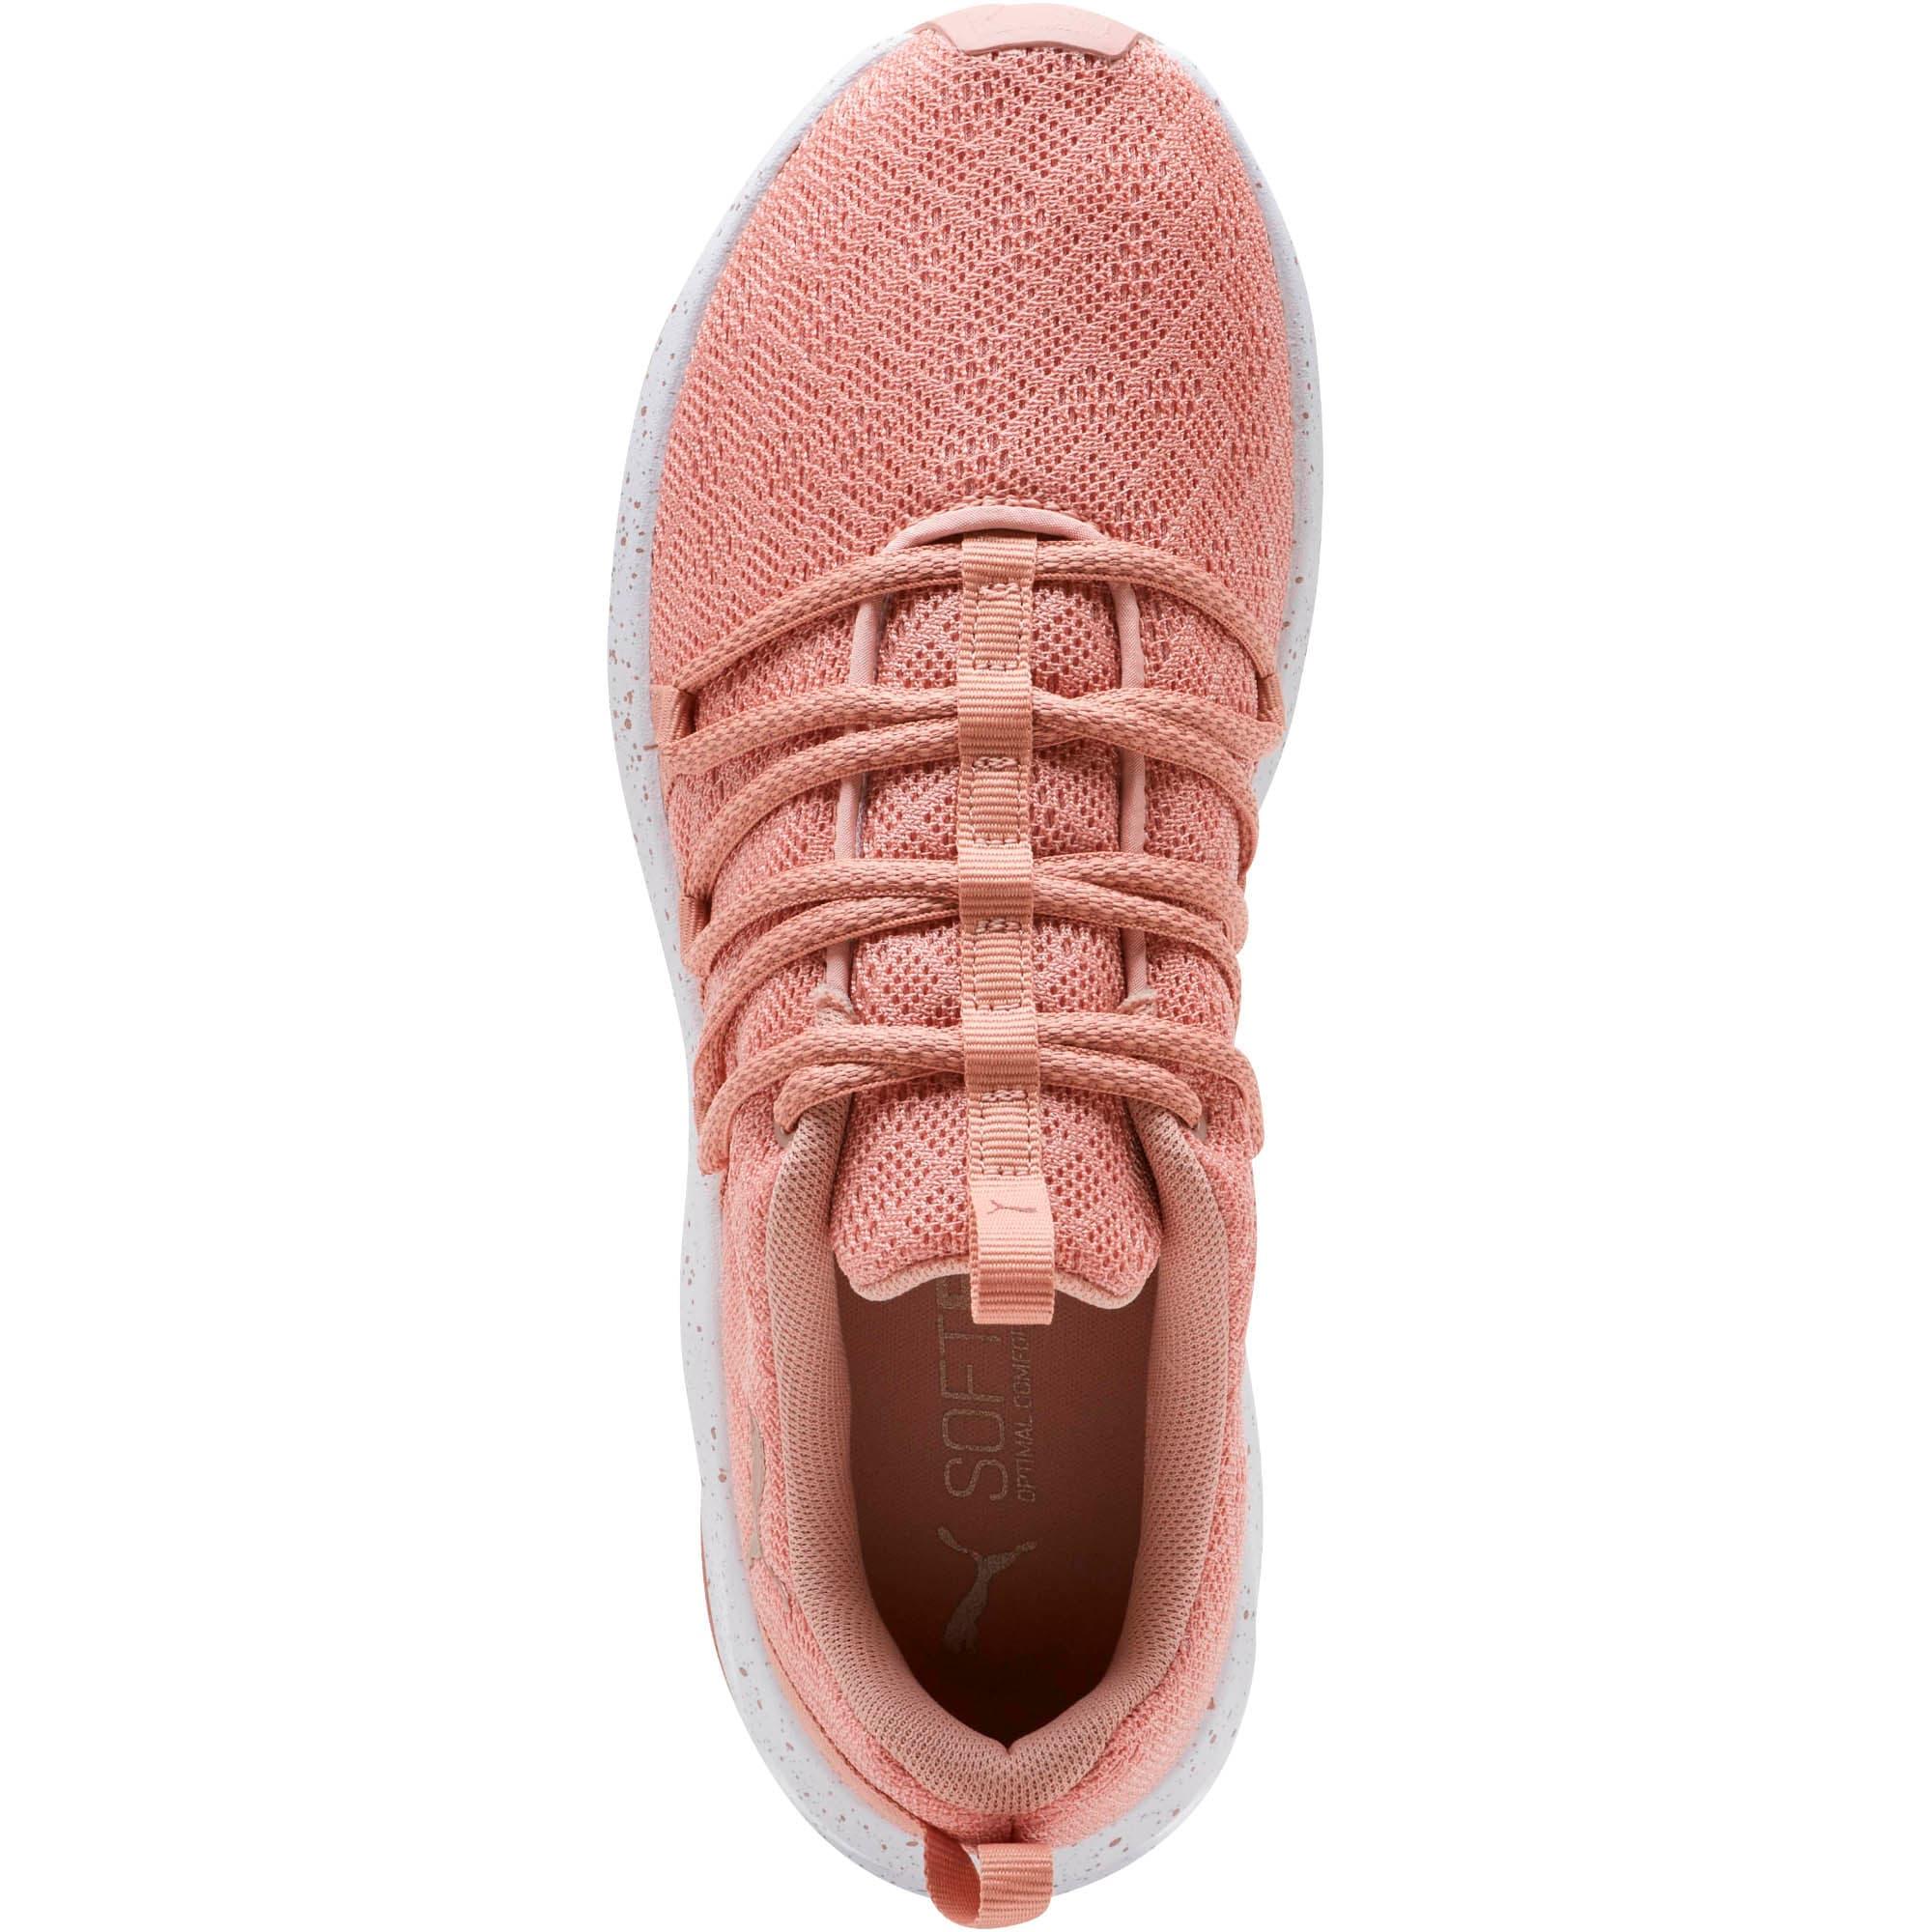 Thumbnail 5 of Prowl Alt Mesh Speckle Women's Training Shoes, Peach Beige-Puma White, medium